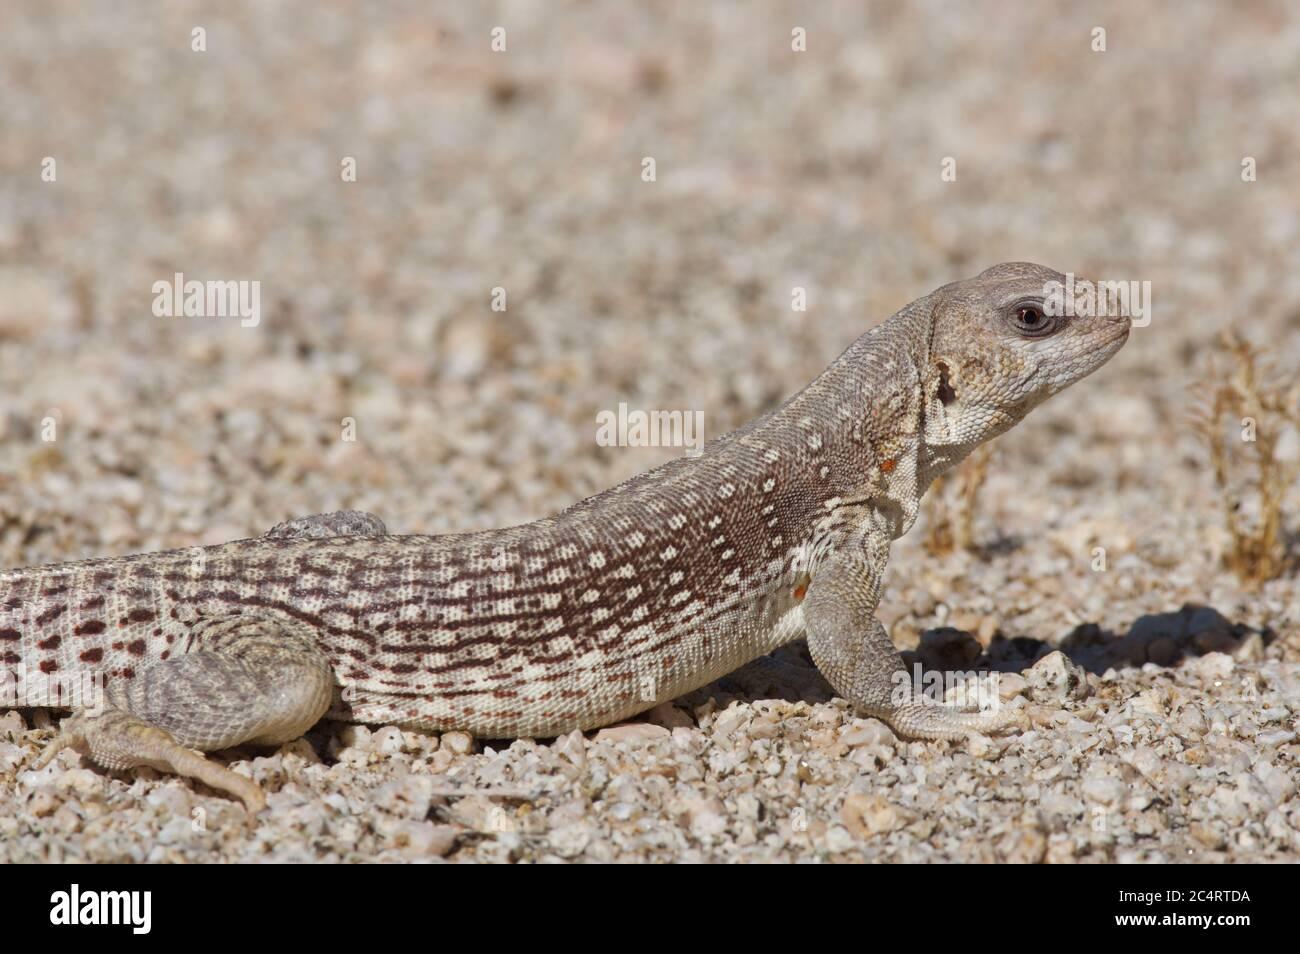 An adult Northern Desert Iguana (Dipsosaurus dorsalis dorsalis) in the Mojave Desert in California Stock Photo